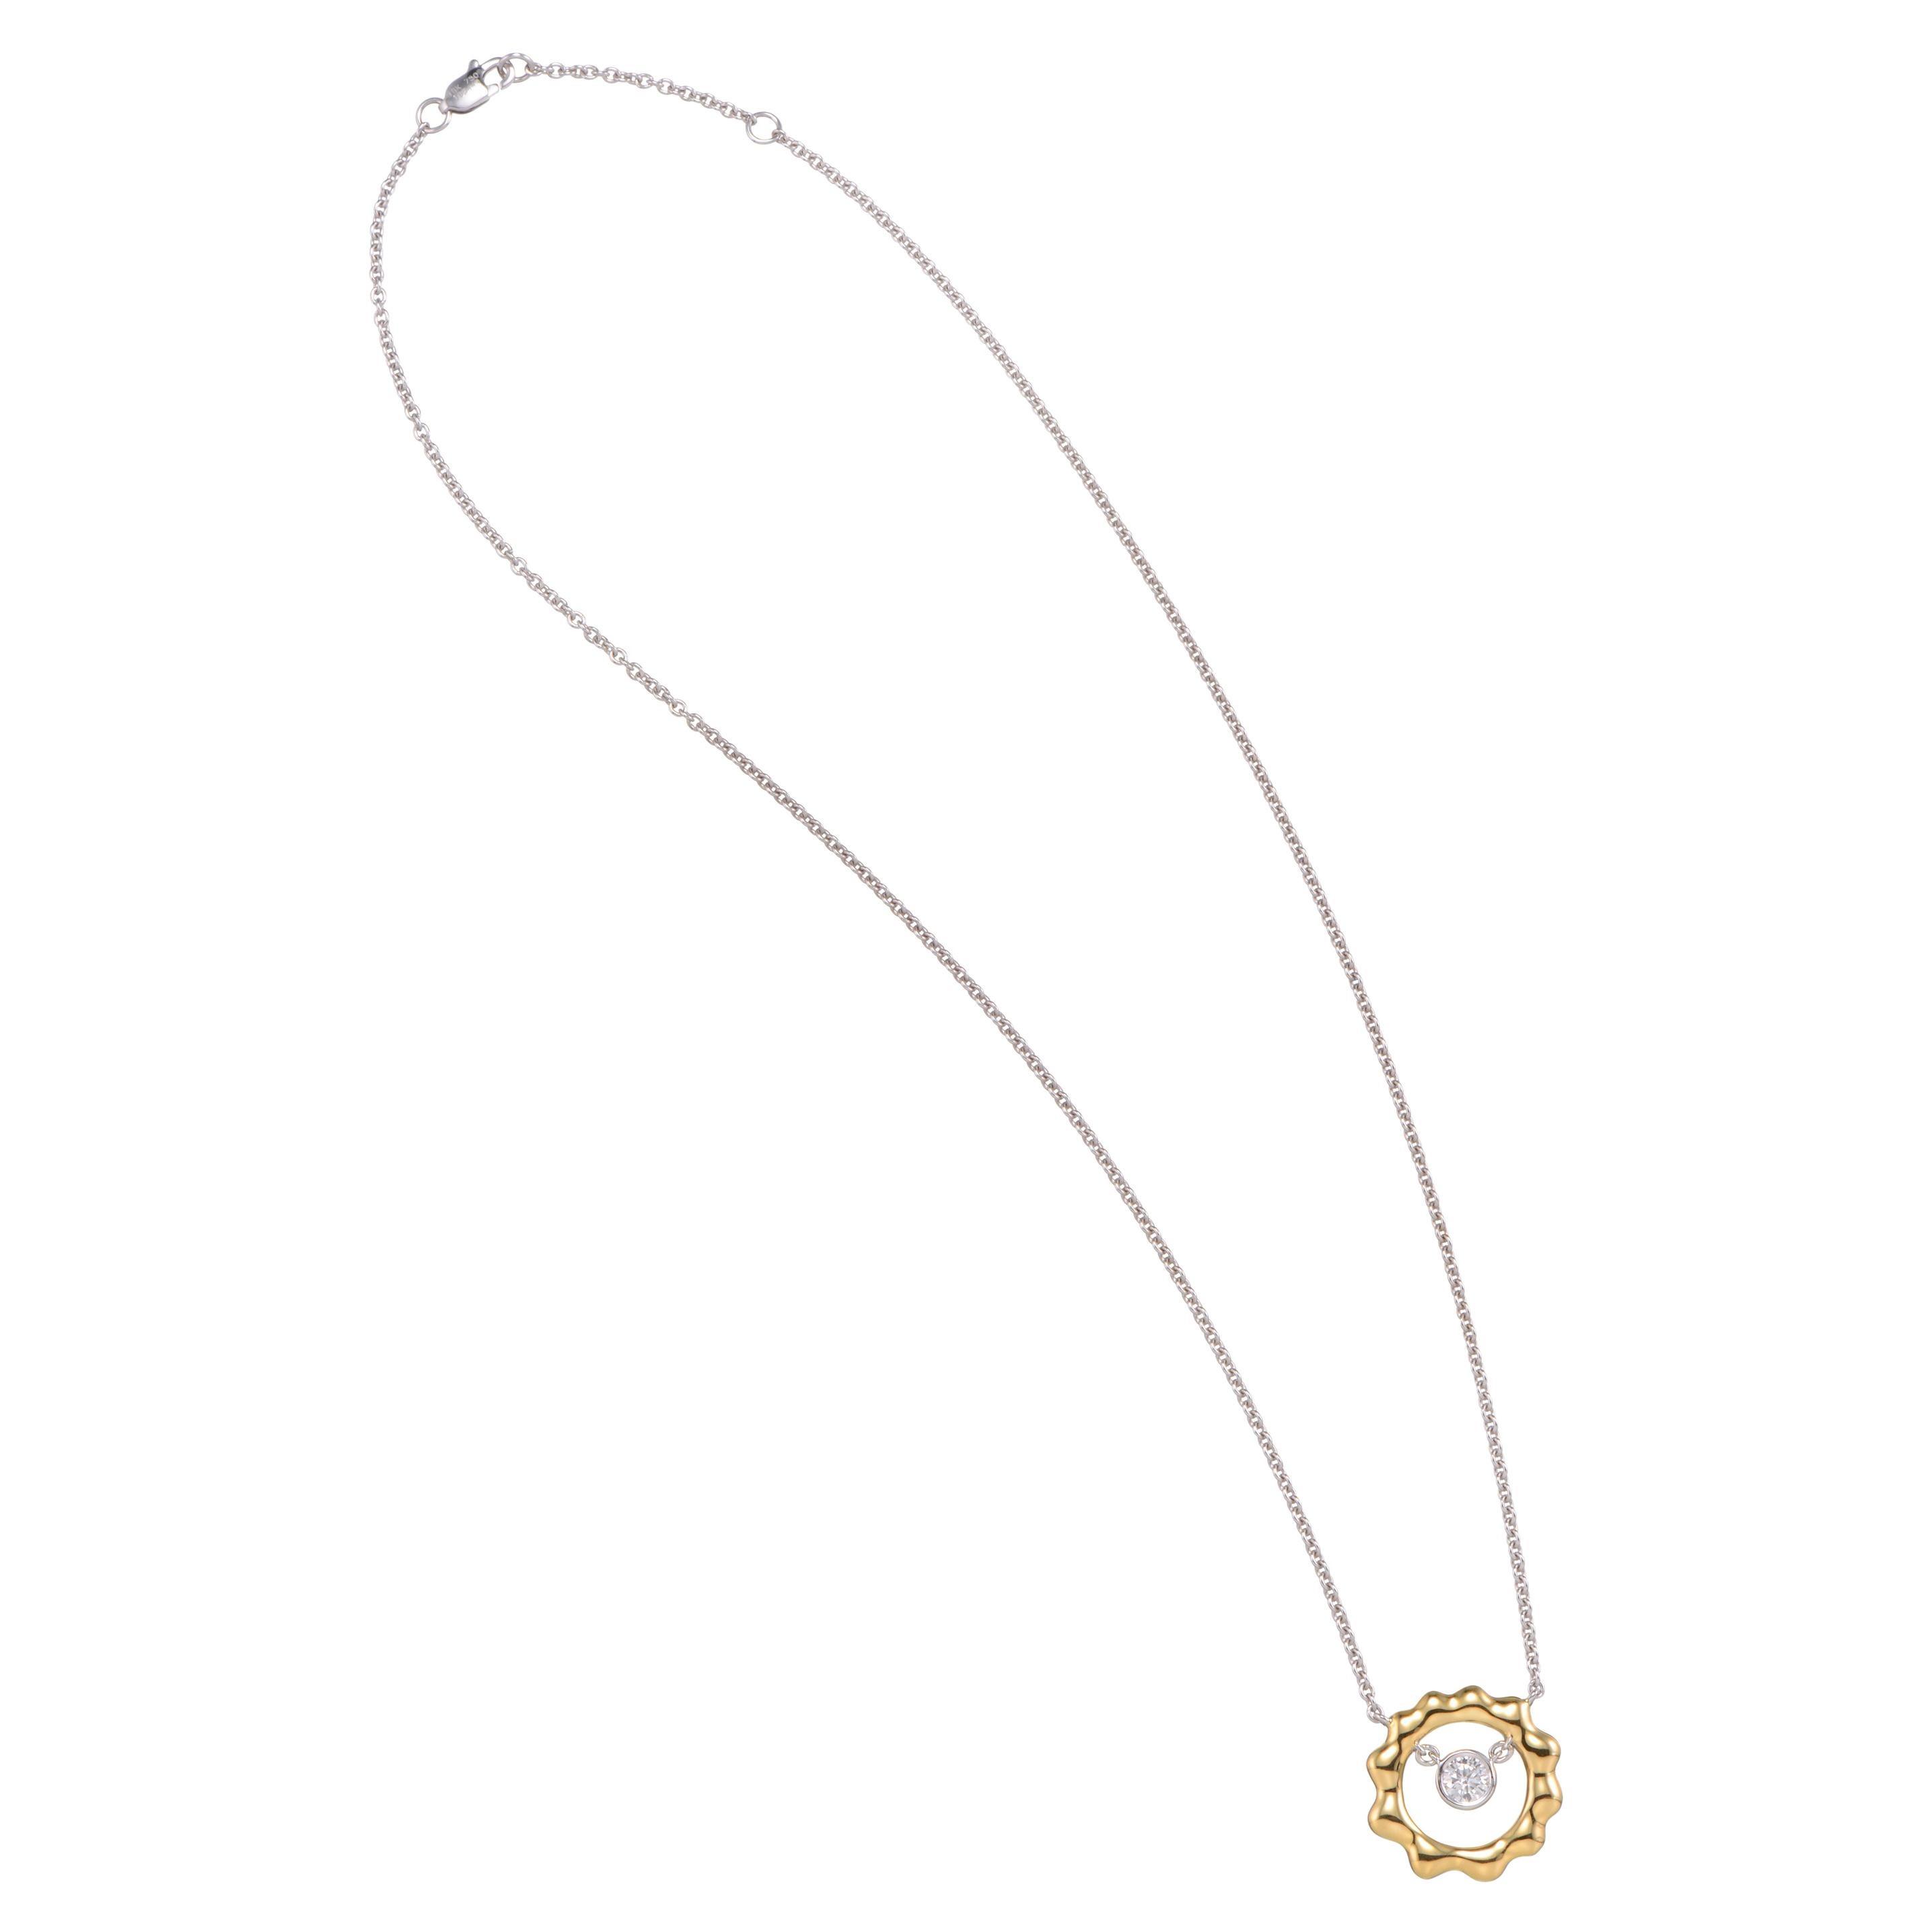 0.28 Carat Diamond 18 Karat Yellow White Gold Pendant Necklace